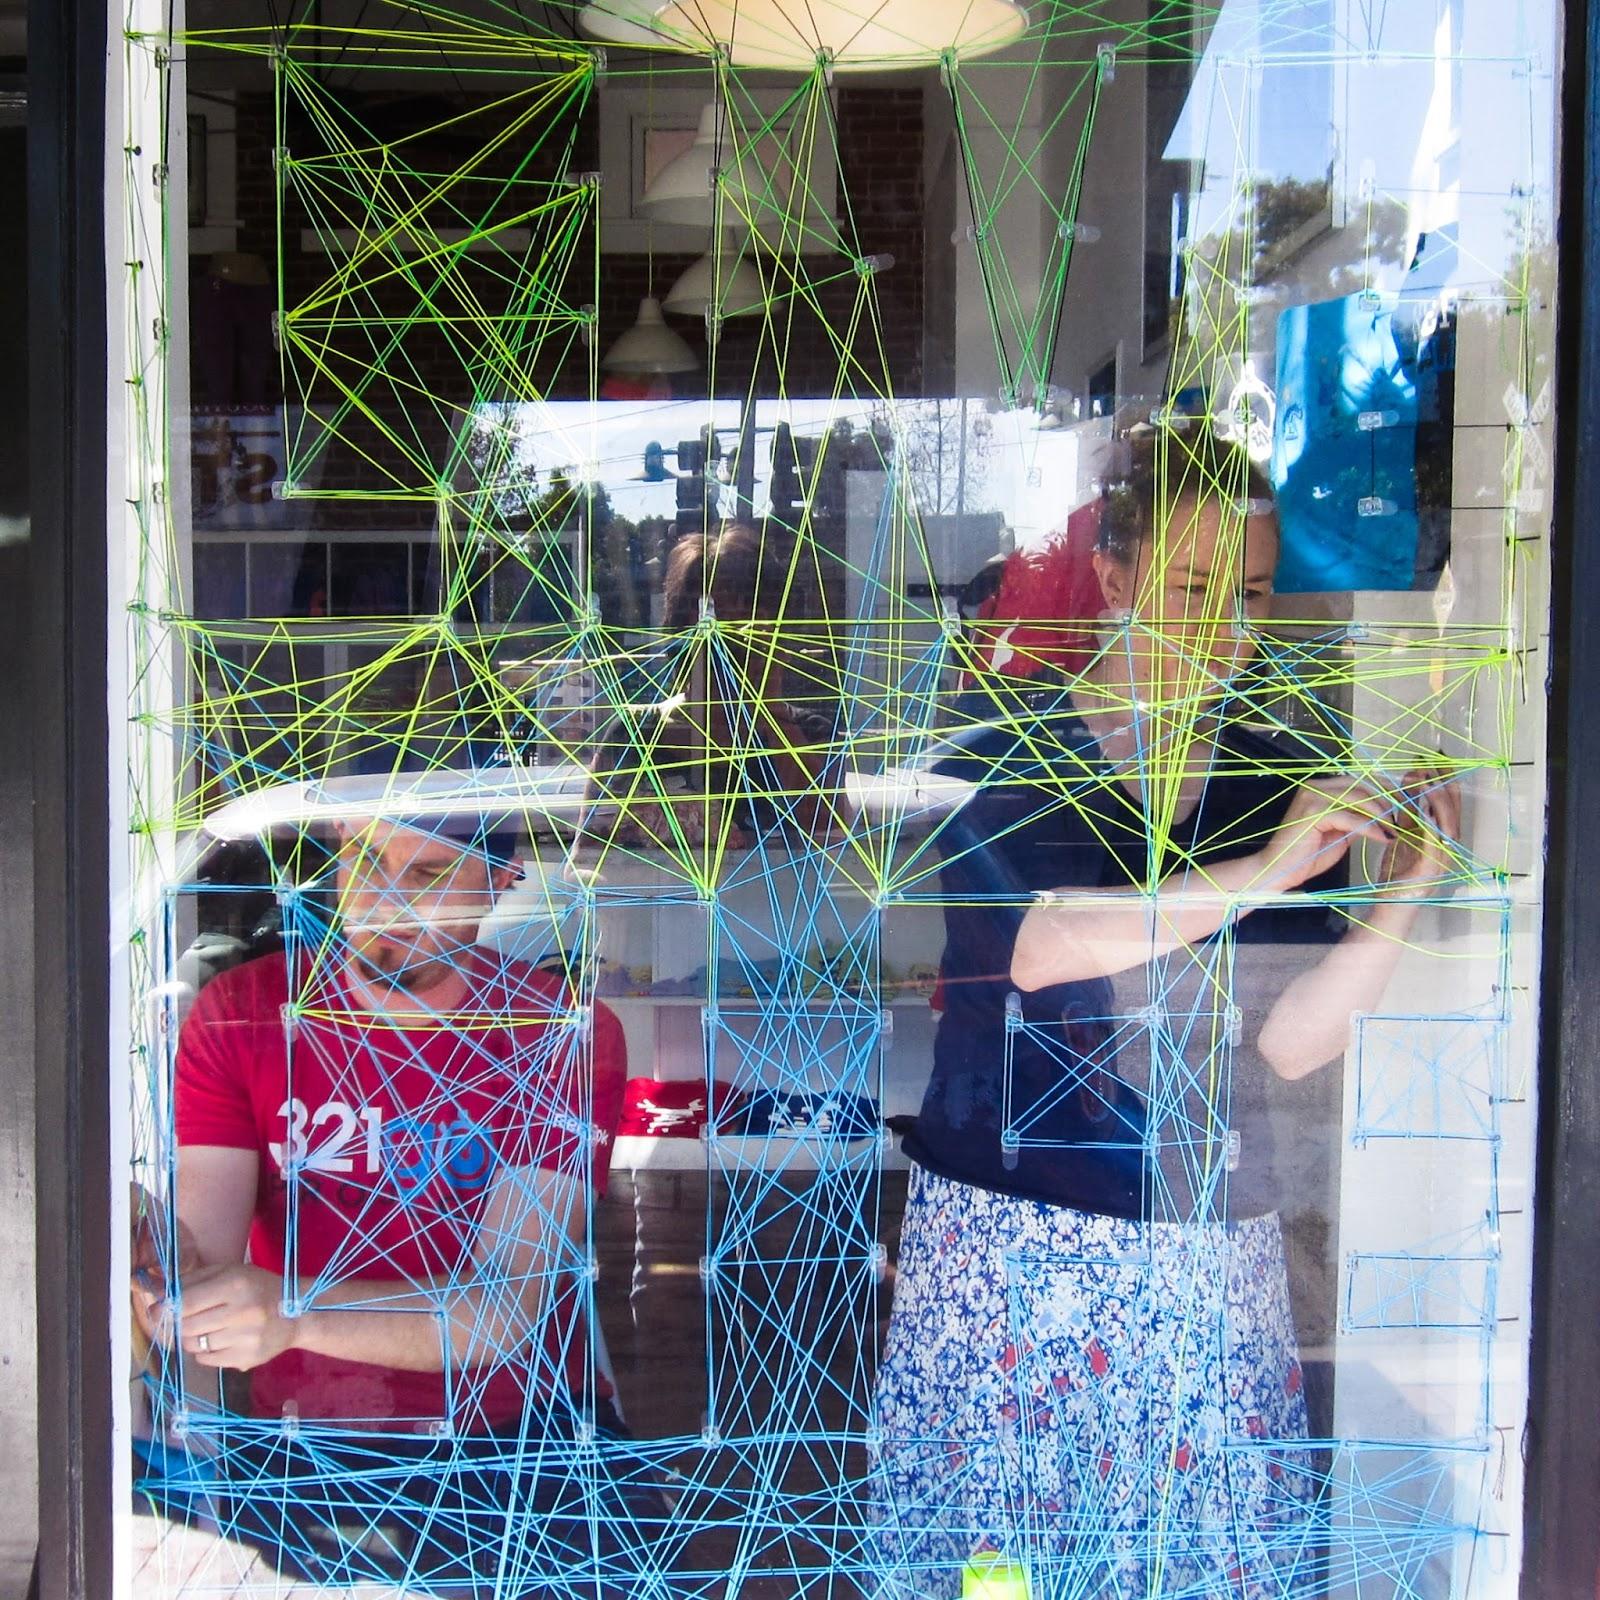 http://www.wodgearclothing.com/ collaborative string art with www.greenbugmarketplace.etsy.com